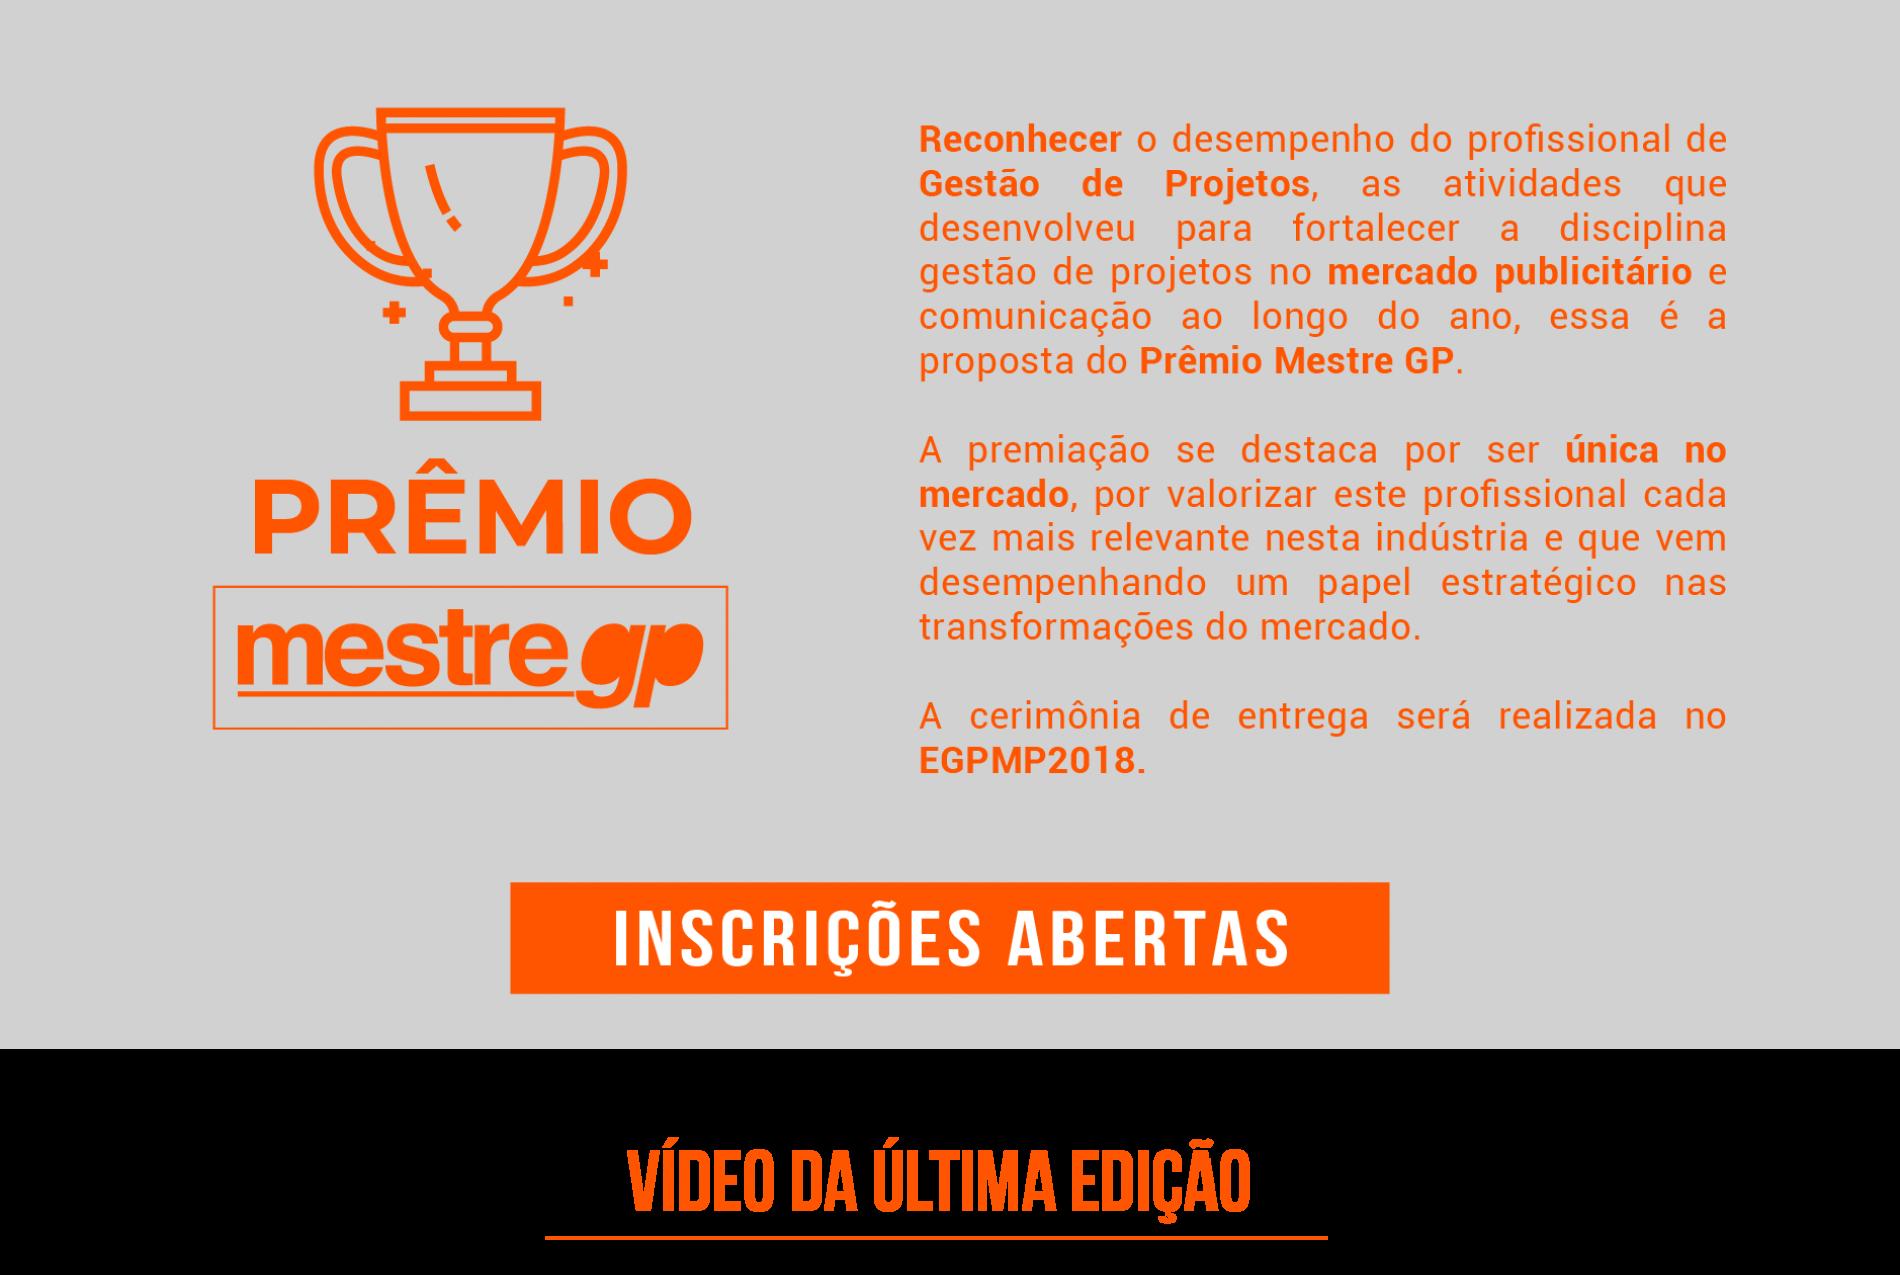 https://www.mestregp.com.br/wp-content/uploads/2018/03/MGP_EGPMP-premio-update-05-1900x1275.png